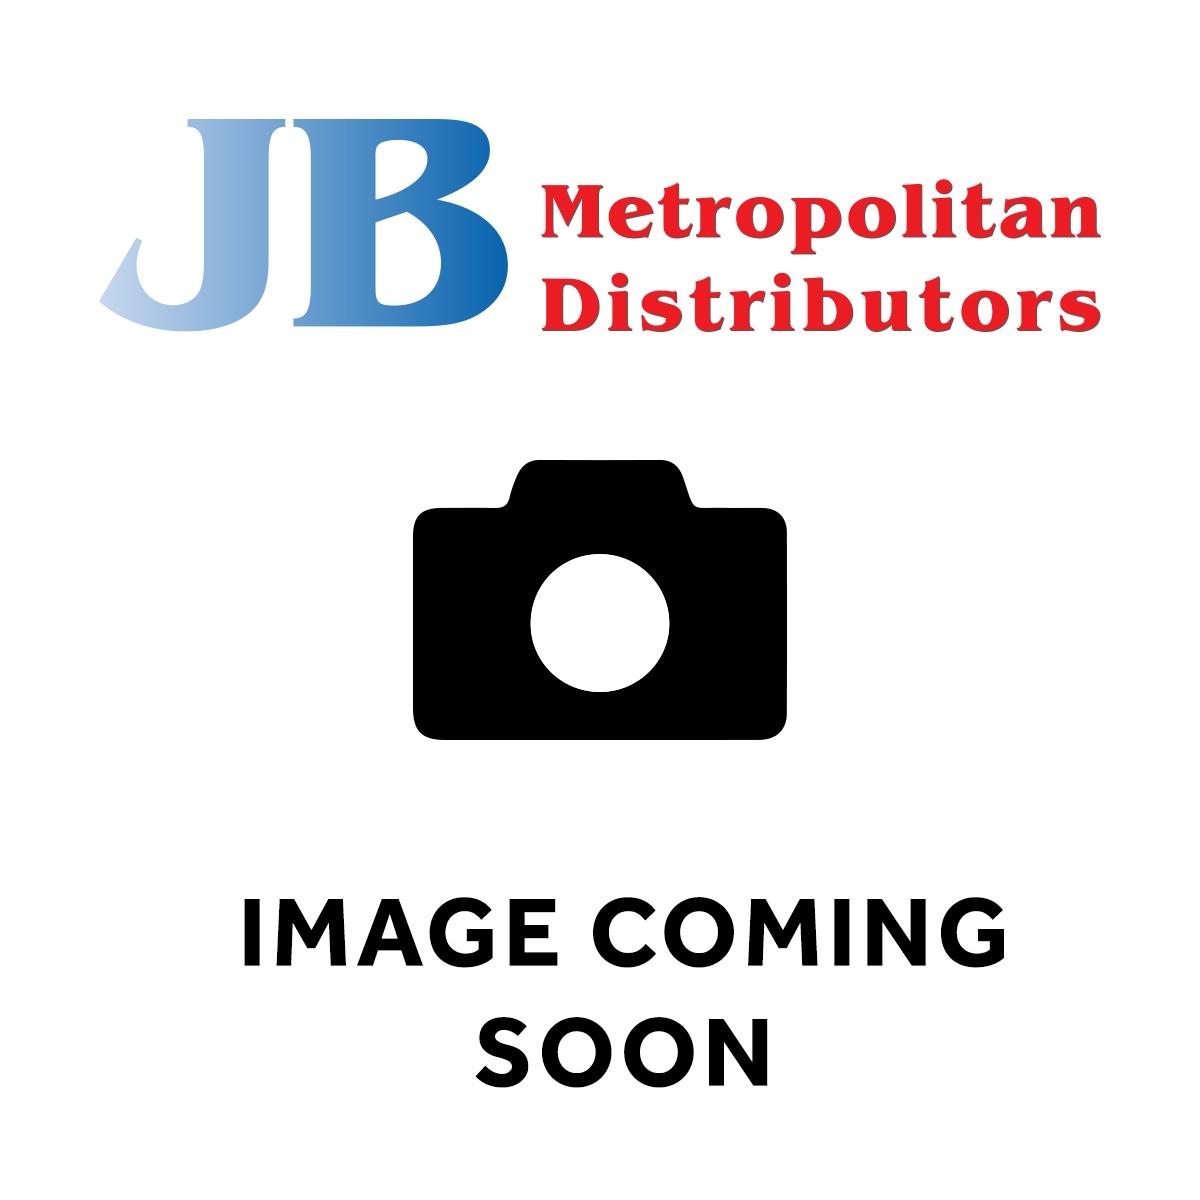 700G CHUM 3 MEATS (W)